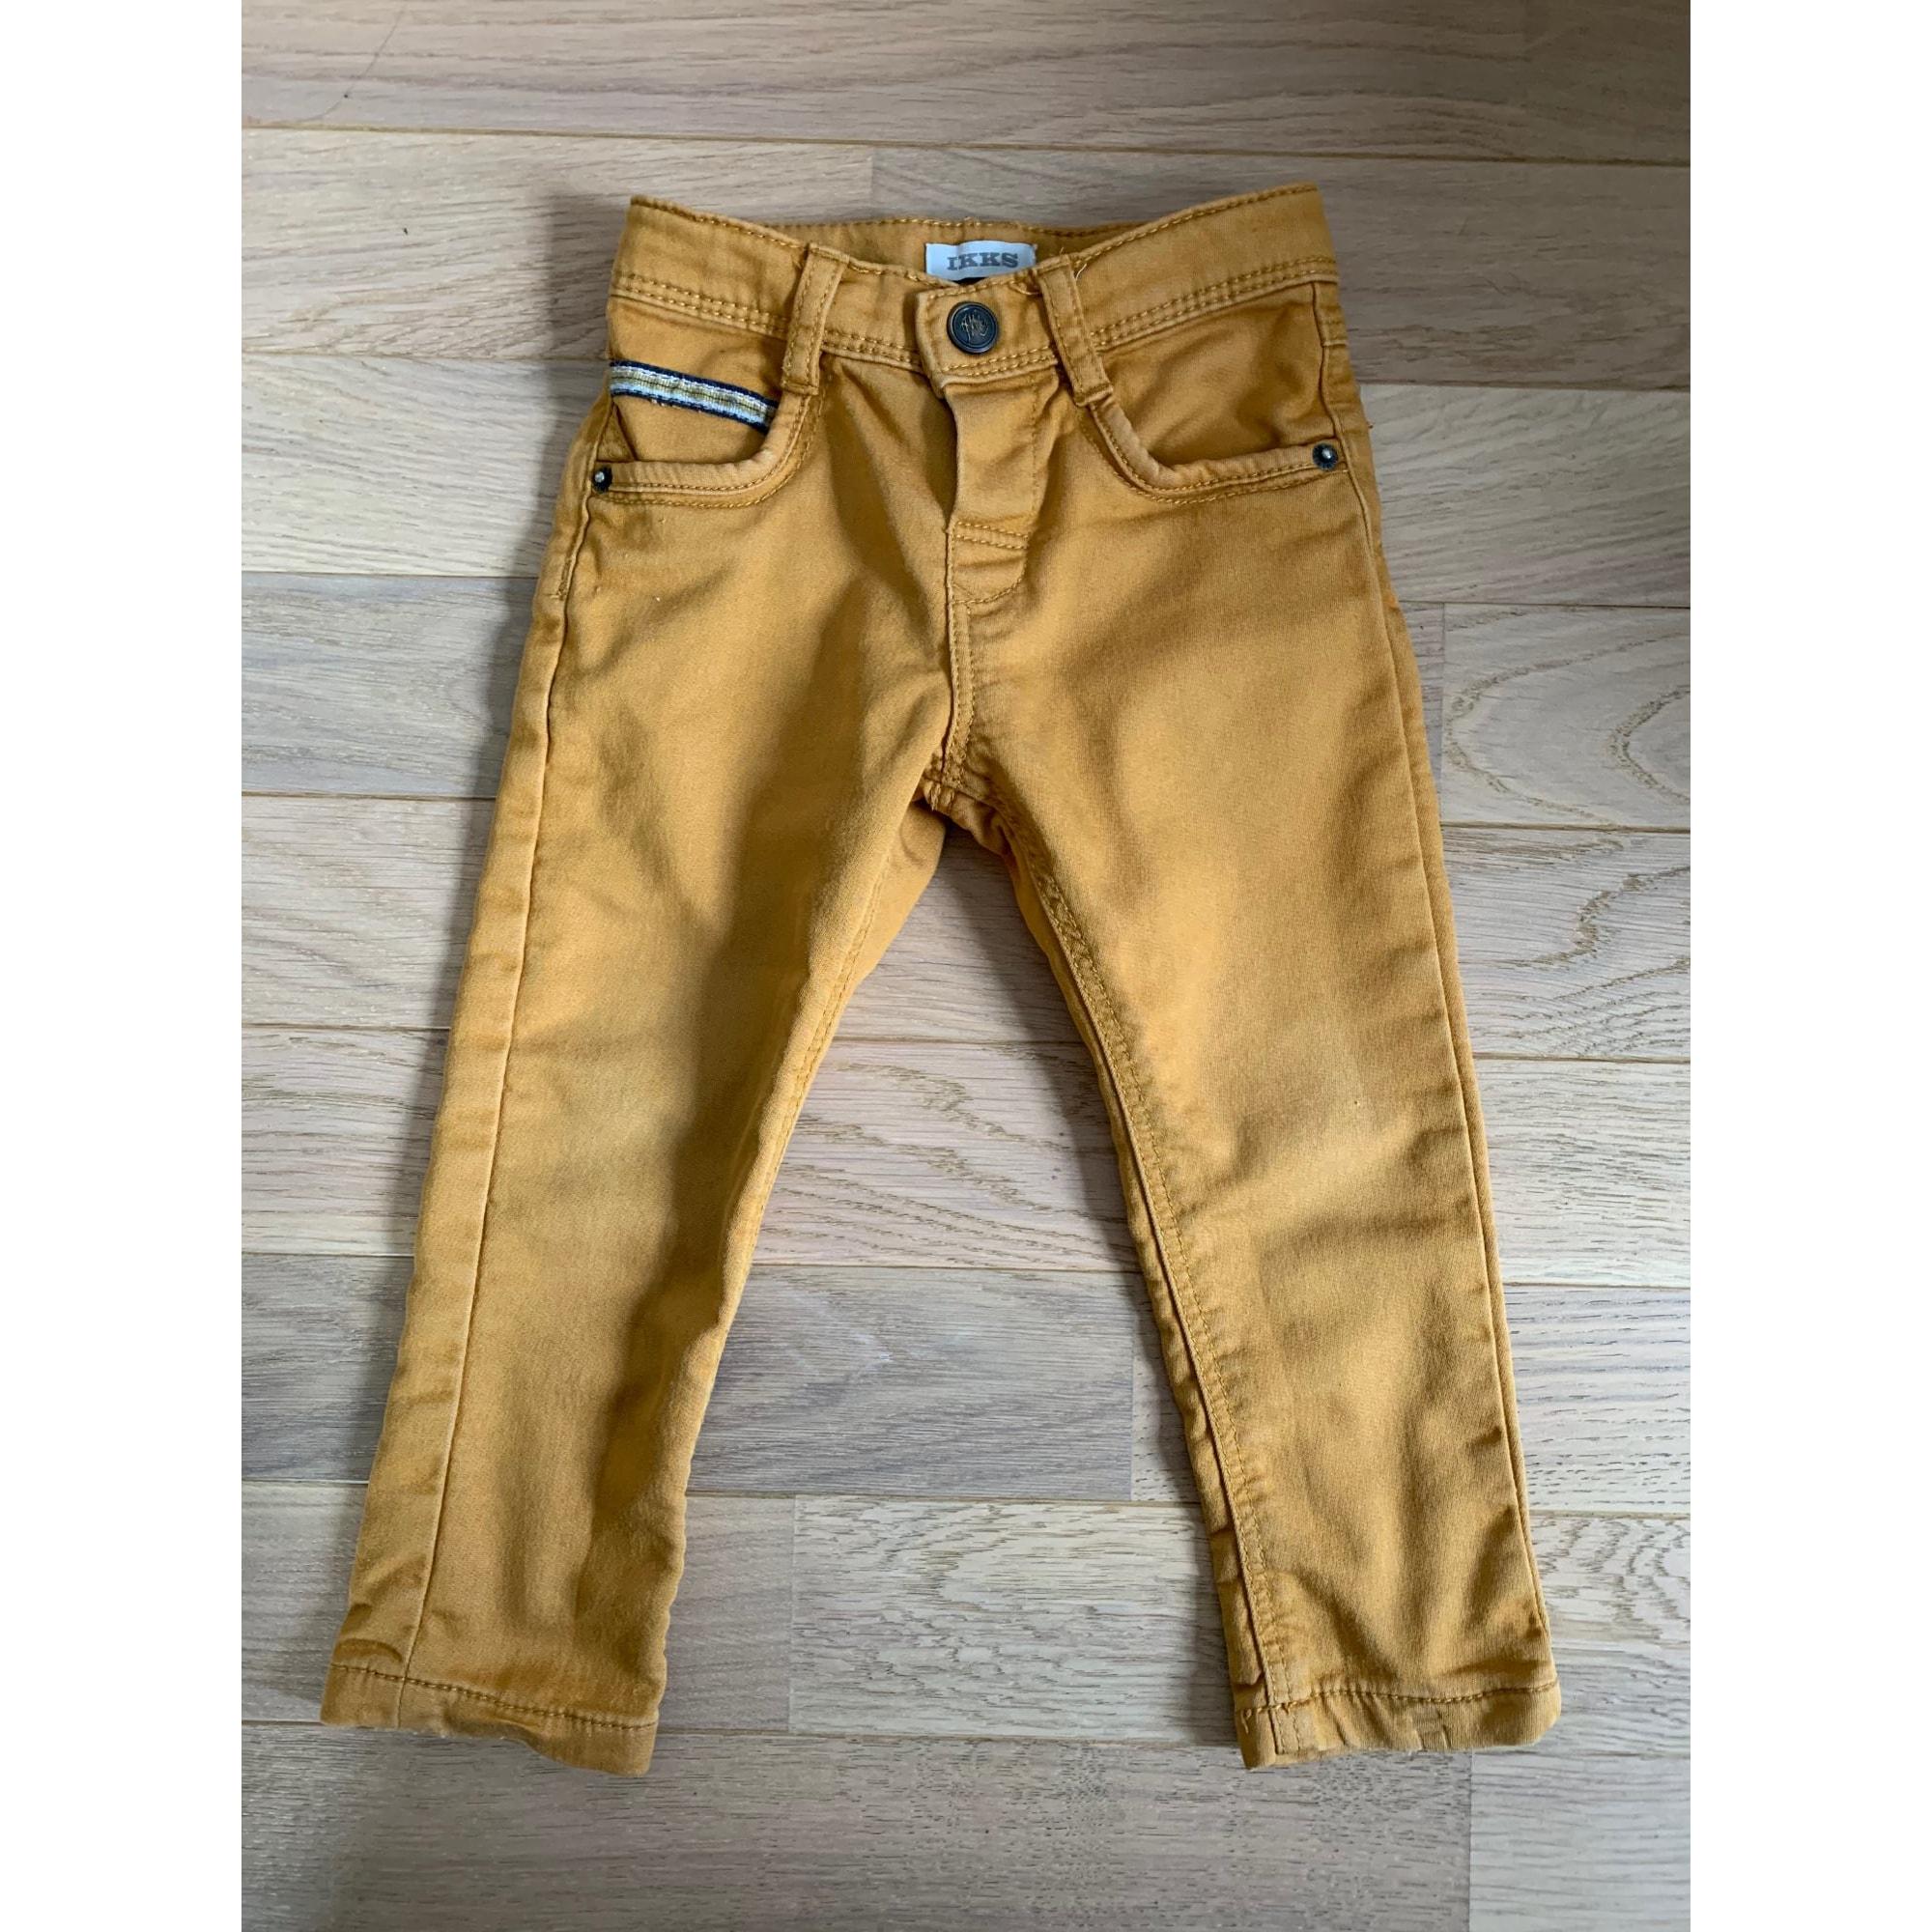 Pantalon IKKS Moutarde